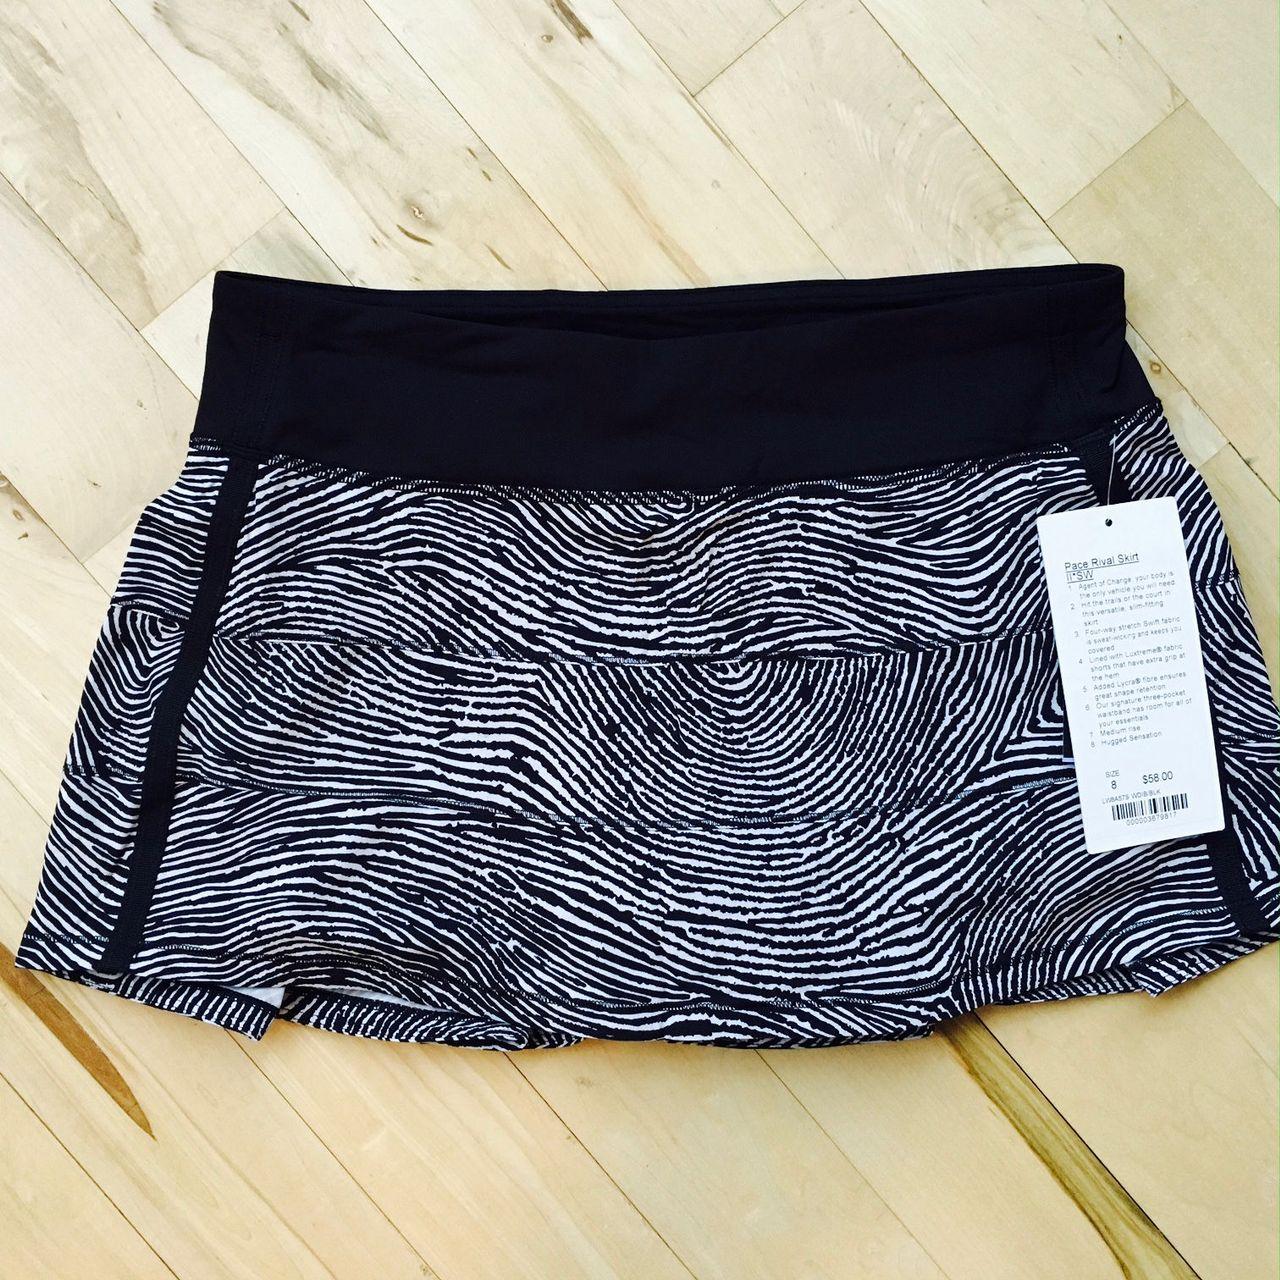 Lululemon Pace Rival Skirt II (Regular) - 2016 Seawheeze - Who Done It Black / Black